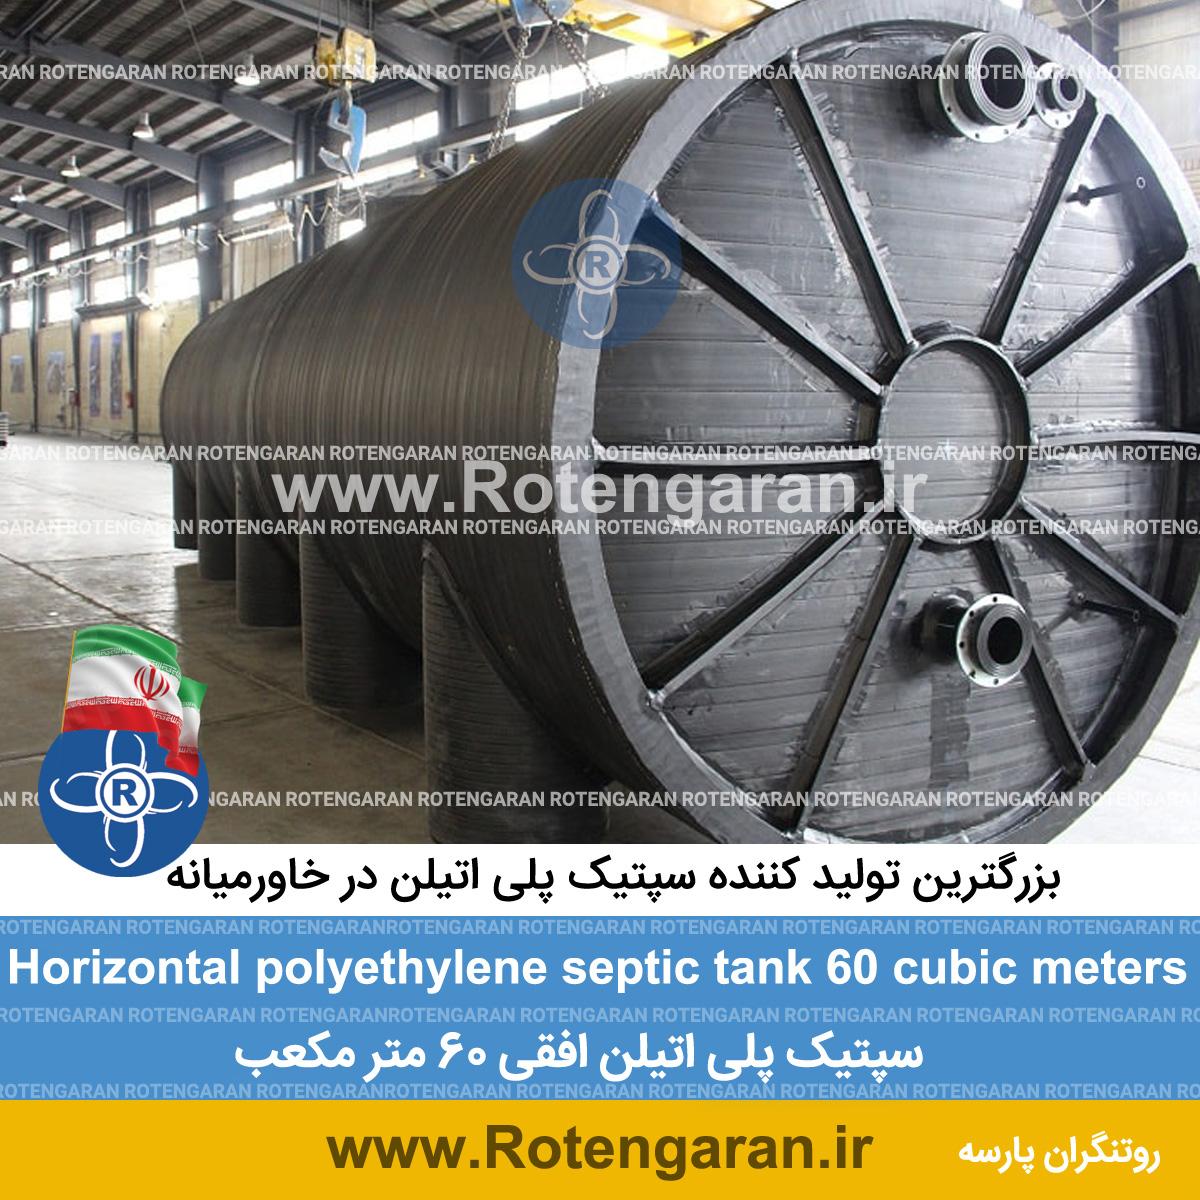 سپتیک تانک - سپتیک تانک دوجداره- سپتیک تانک پلی اتیلن